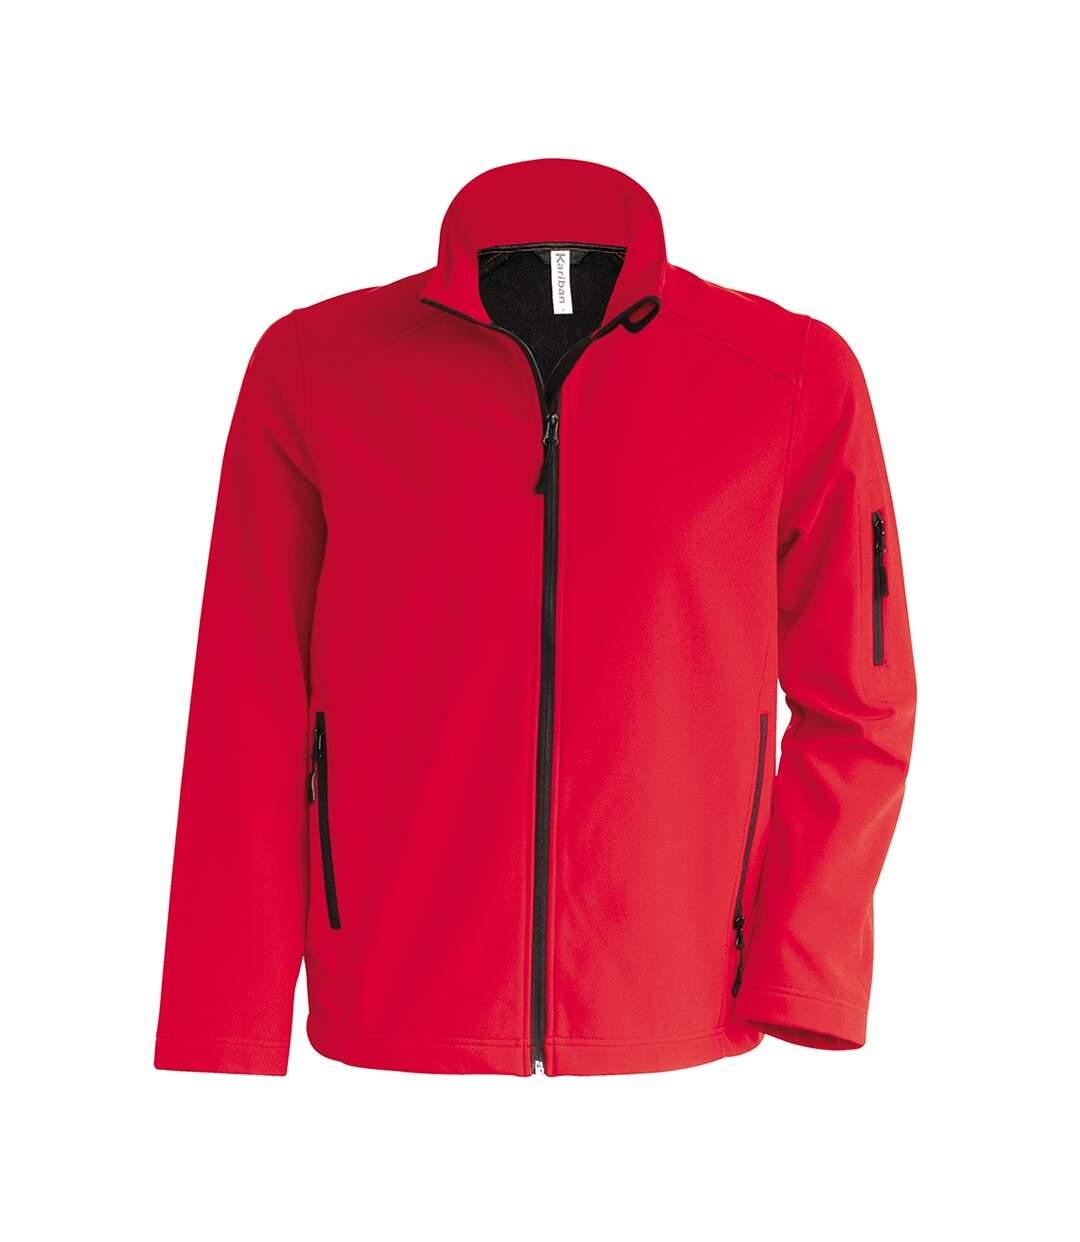 Kariban Mens Soft Shell Jacket (Red) - UTPC3824